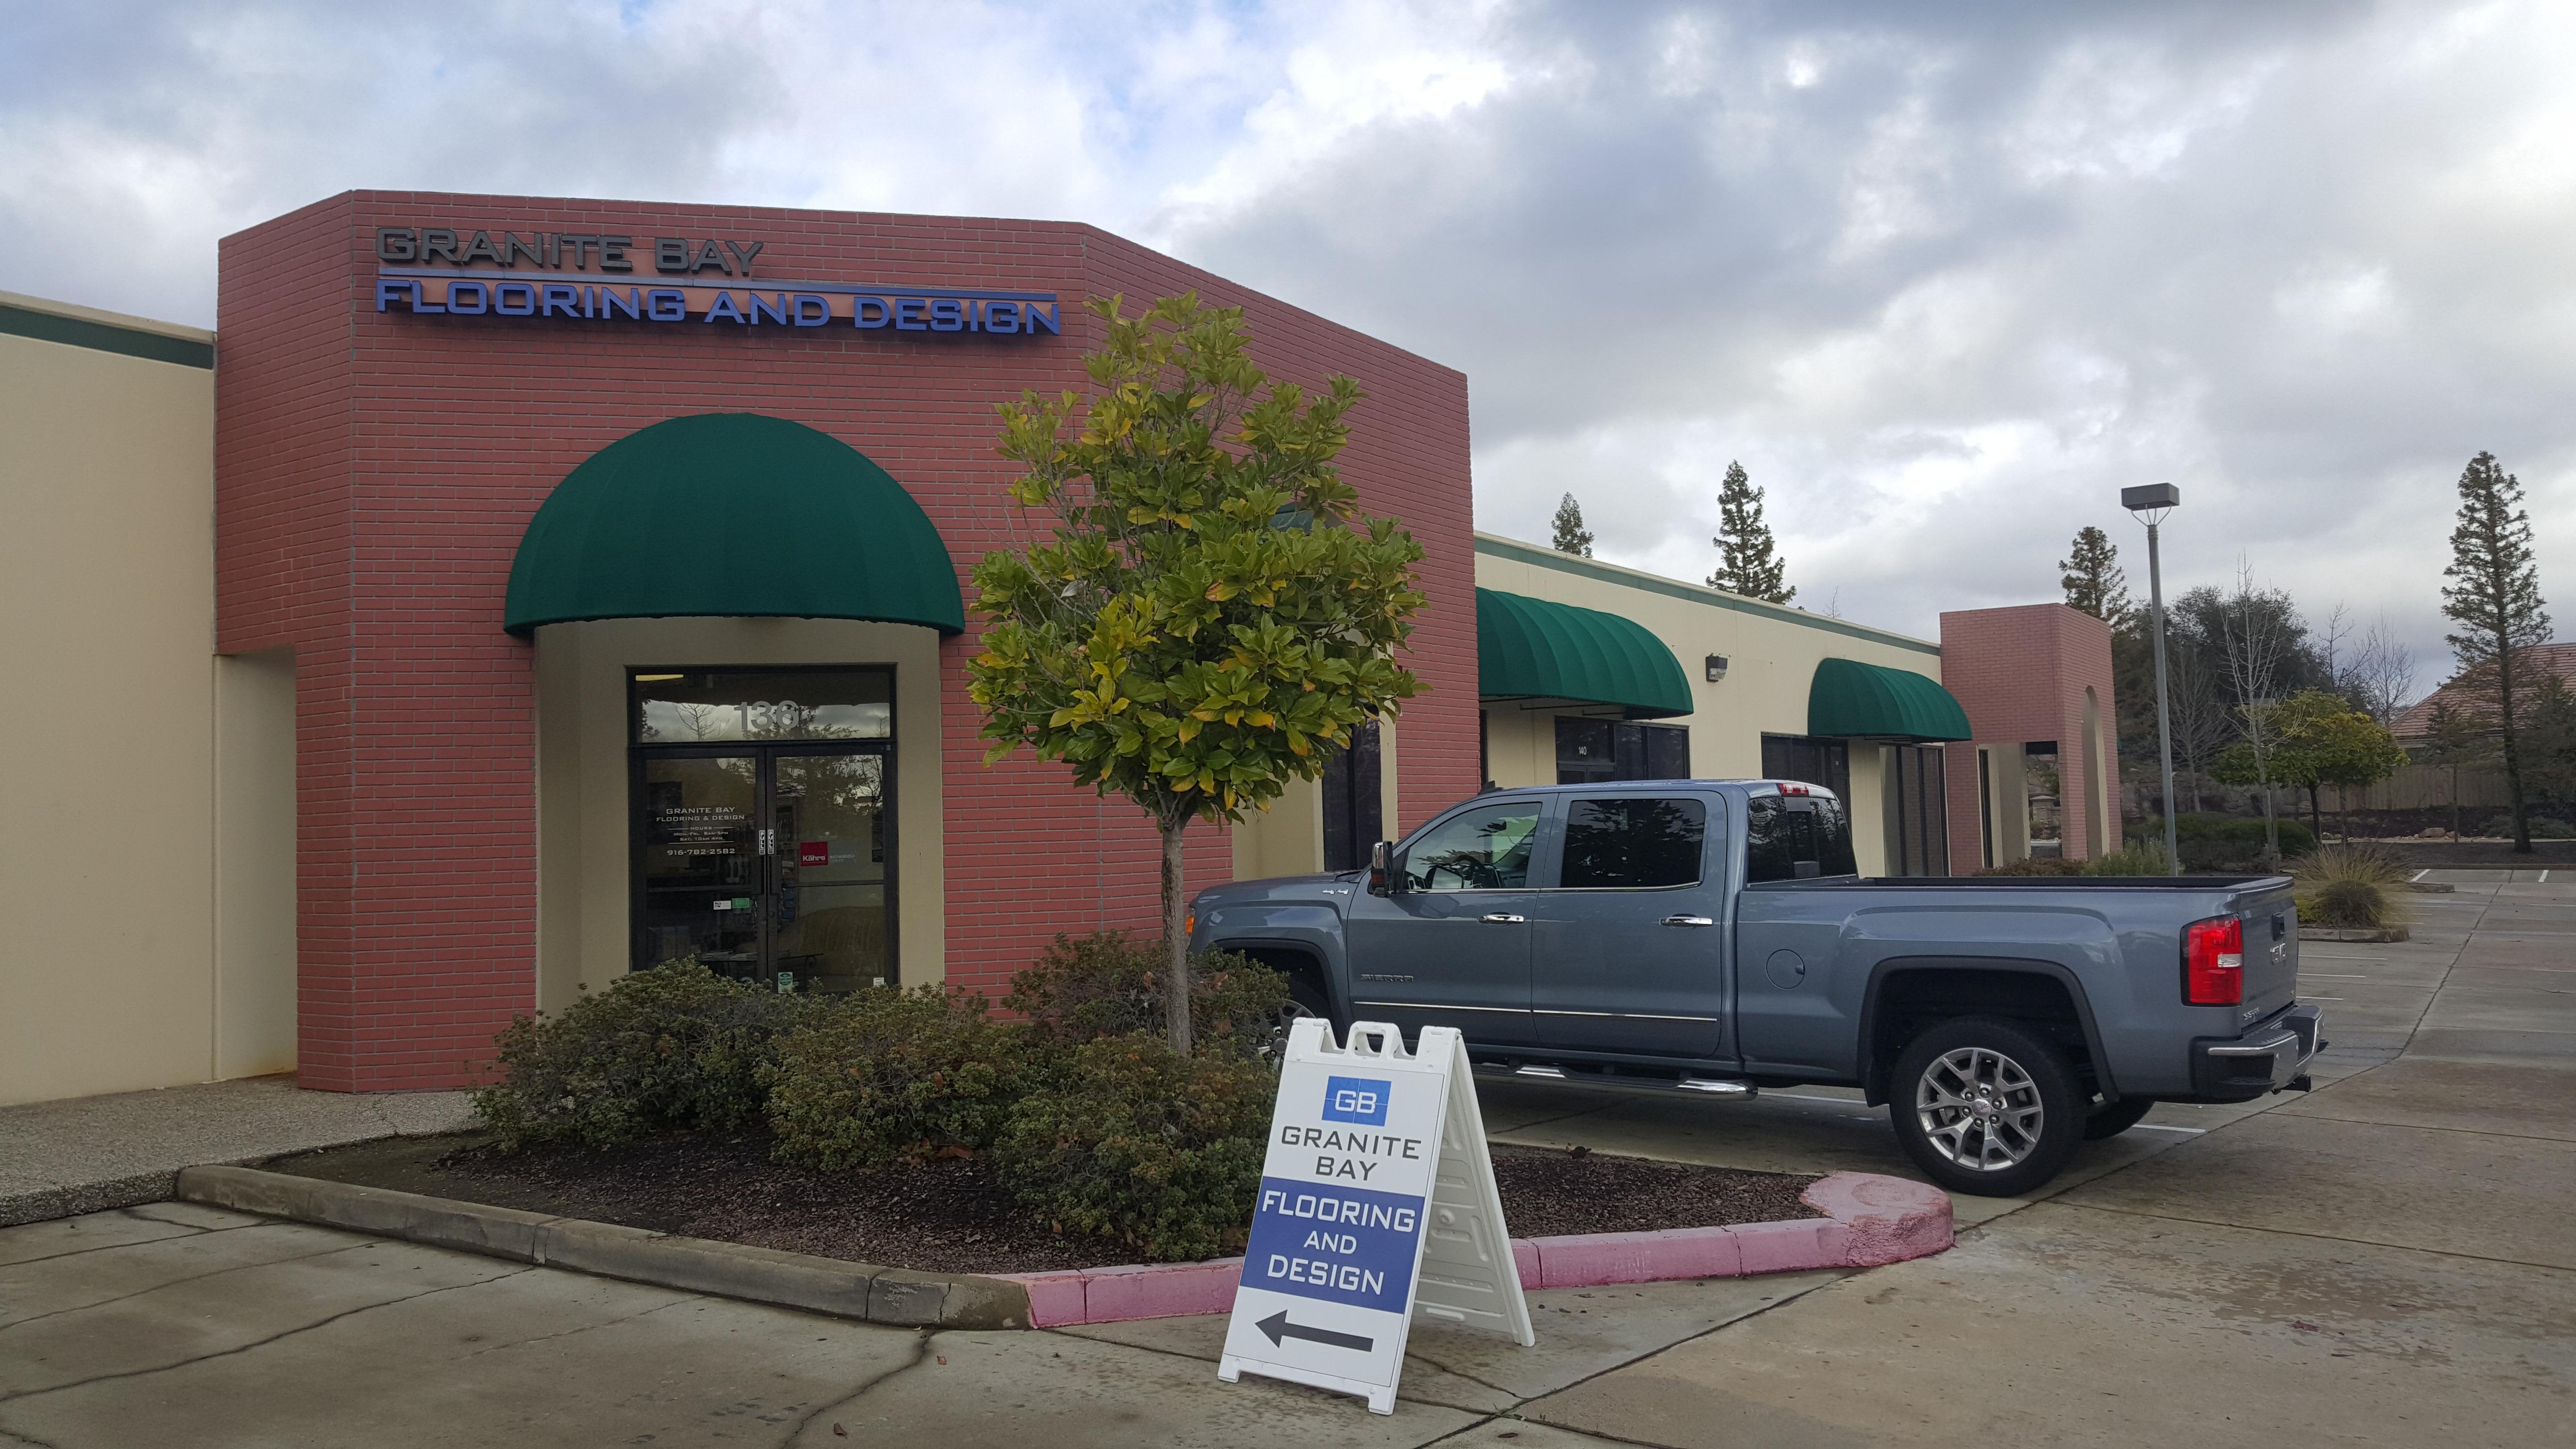 Granite Bay Flooring and Design - 8303 Sierra College Blvd #136, Roseville, CA 95661